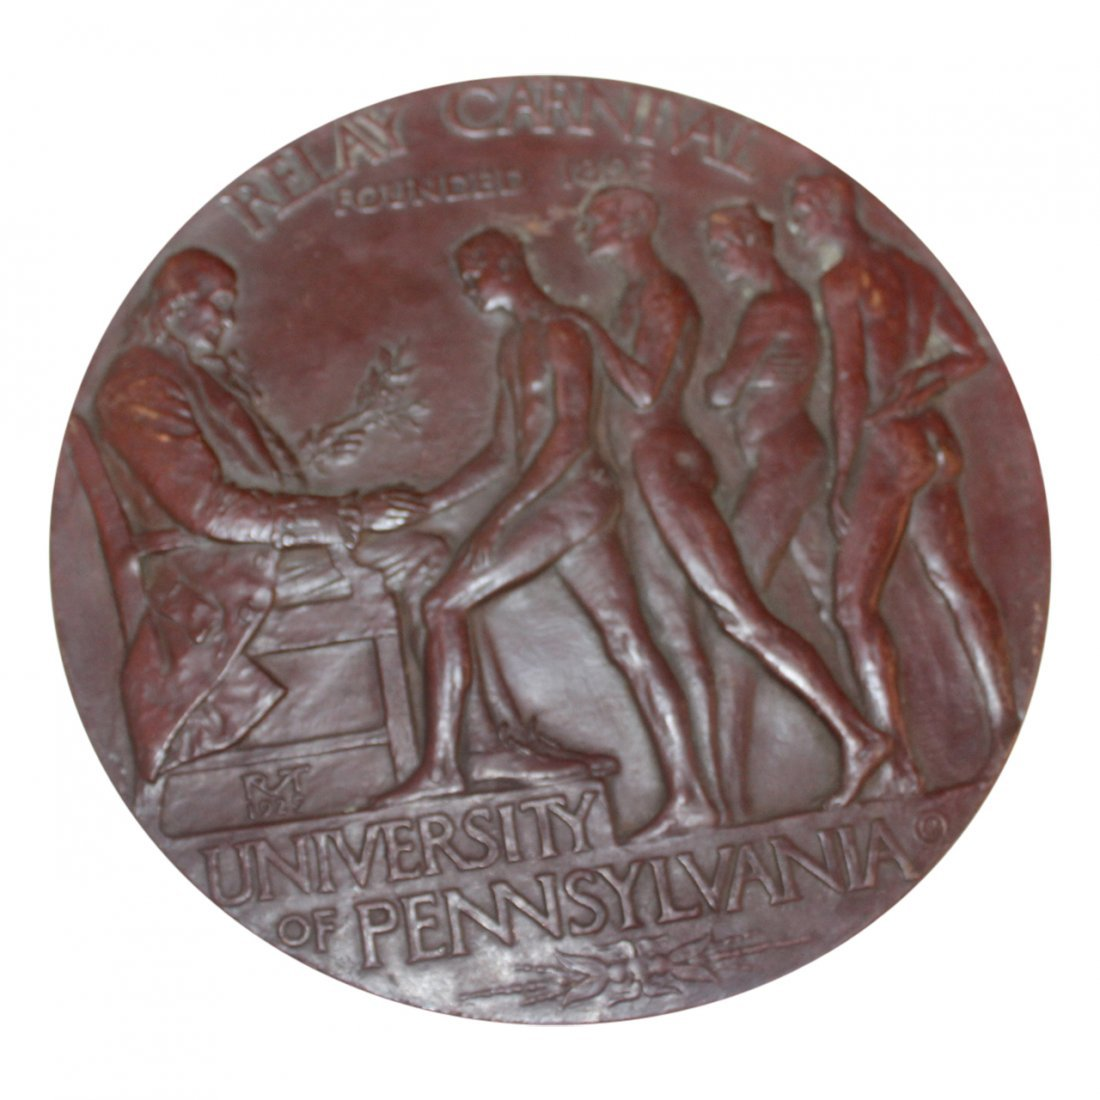 Bronze University of Pennsylvania  Vintage Plaque